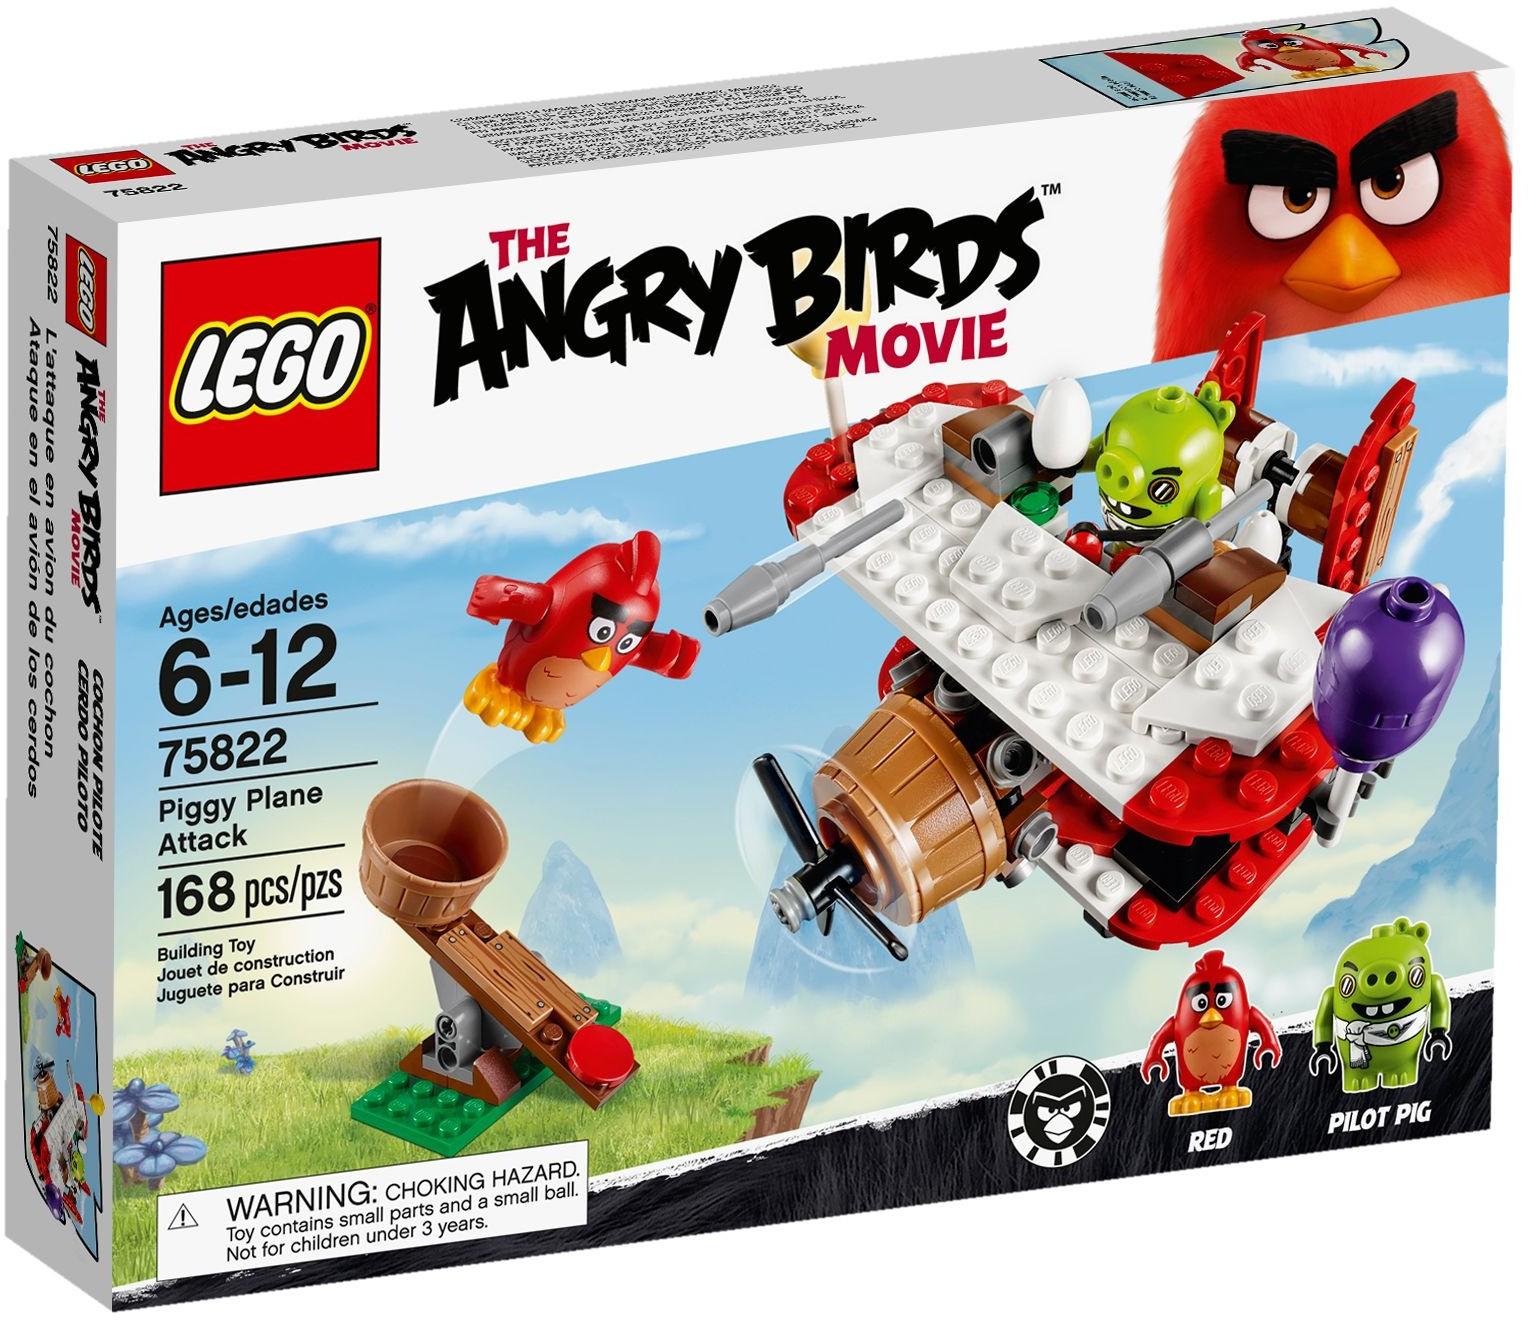 75822 Atak Samolotem świnek Piggy Plane Attack Klocki Lego Angry